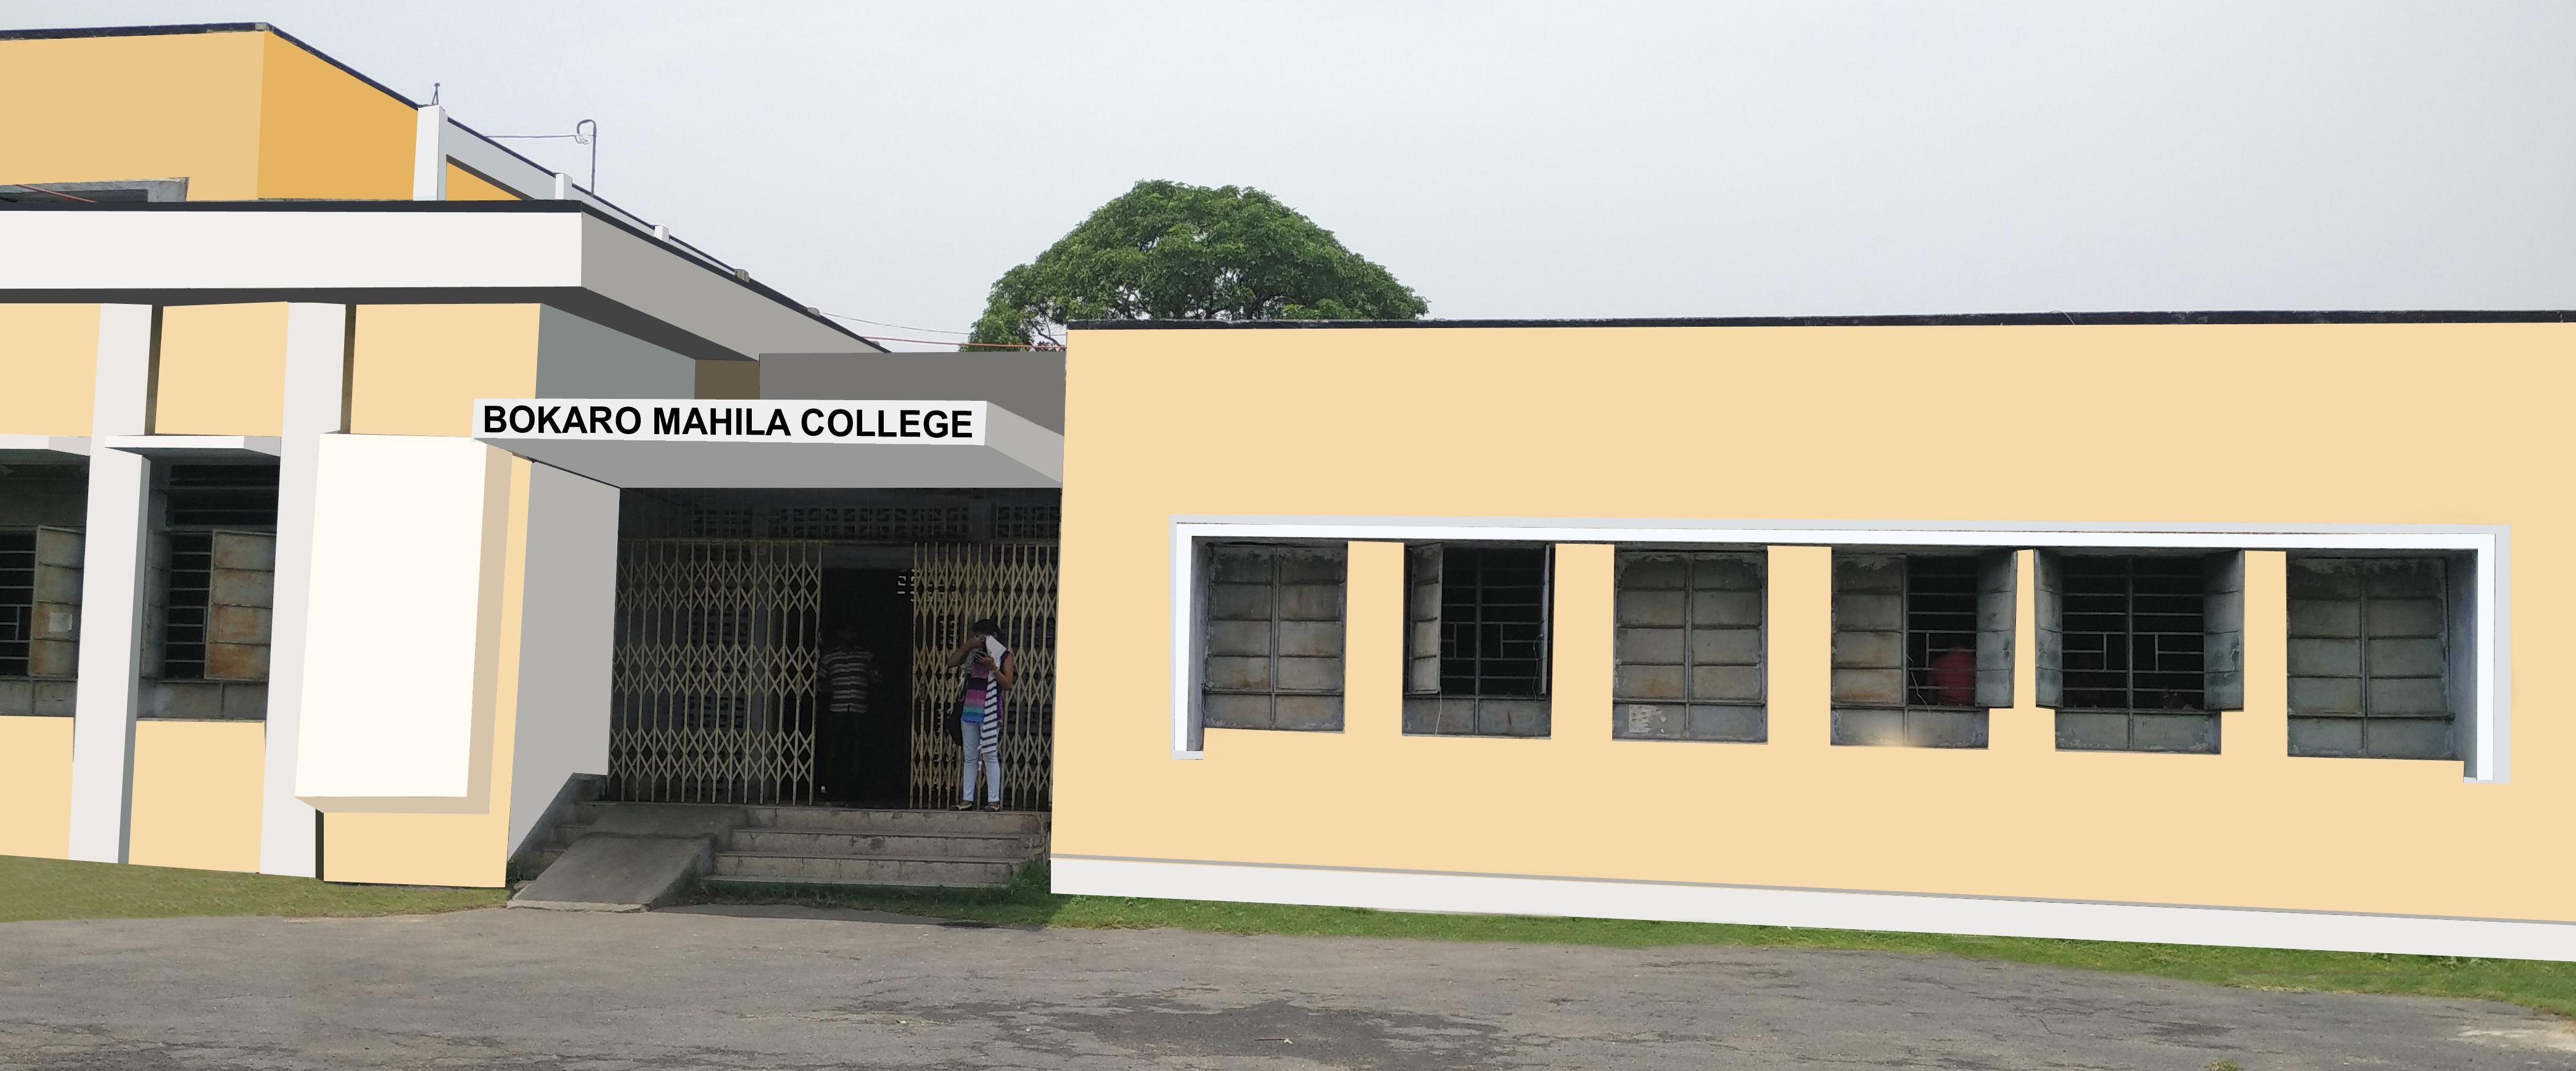 Bokaro Mahila College